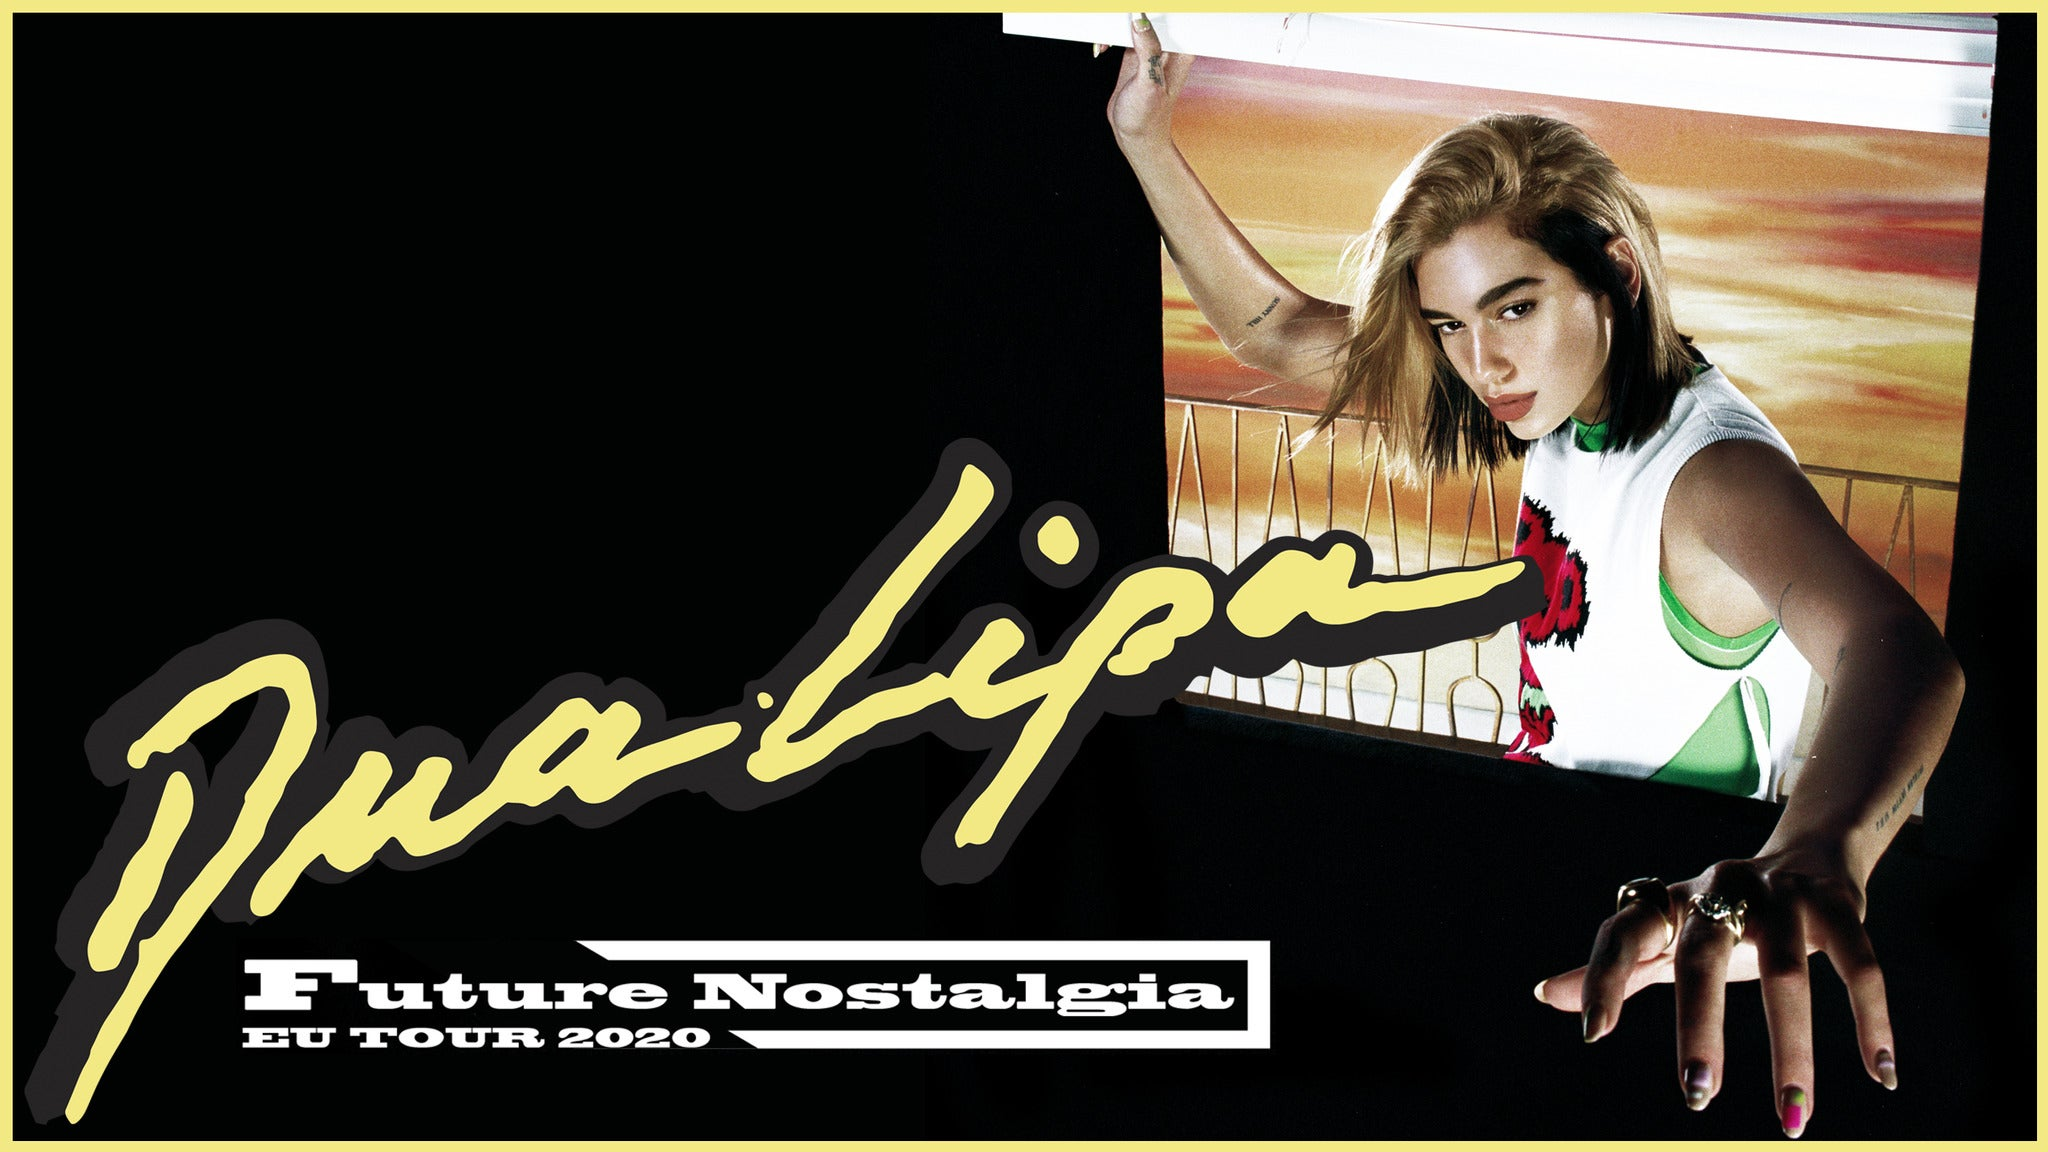 Dua Lipa: Future Nostalgia Tour - Dua's House Party